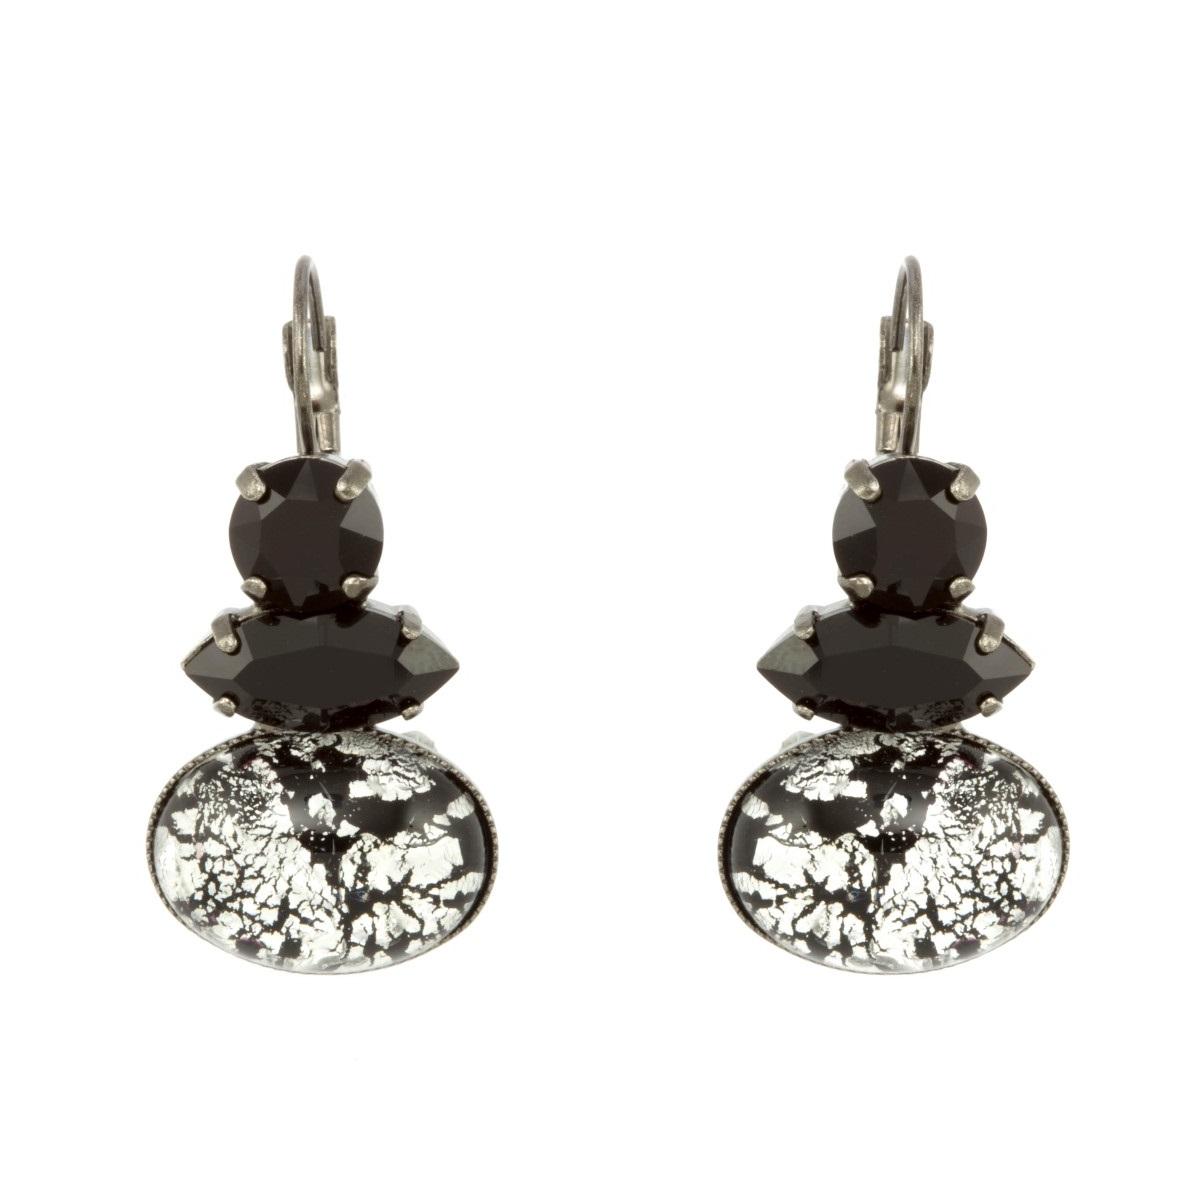 9b6e9d2538 ARTWEAR DIMITRIADIS – Γυναικεία σκουλαρίκια ARTWEAR DIMITRIADIS με μαύρα  στρας